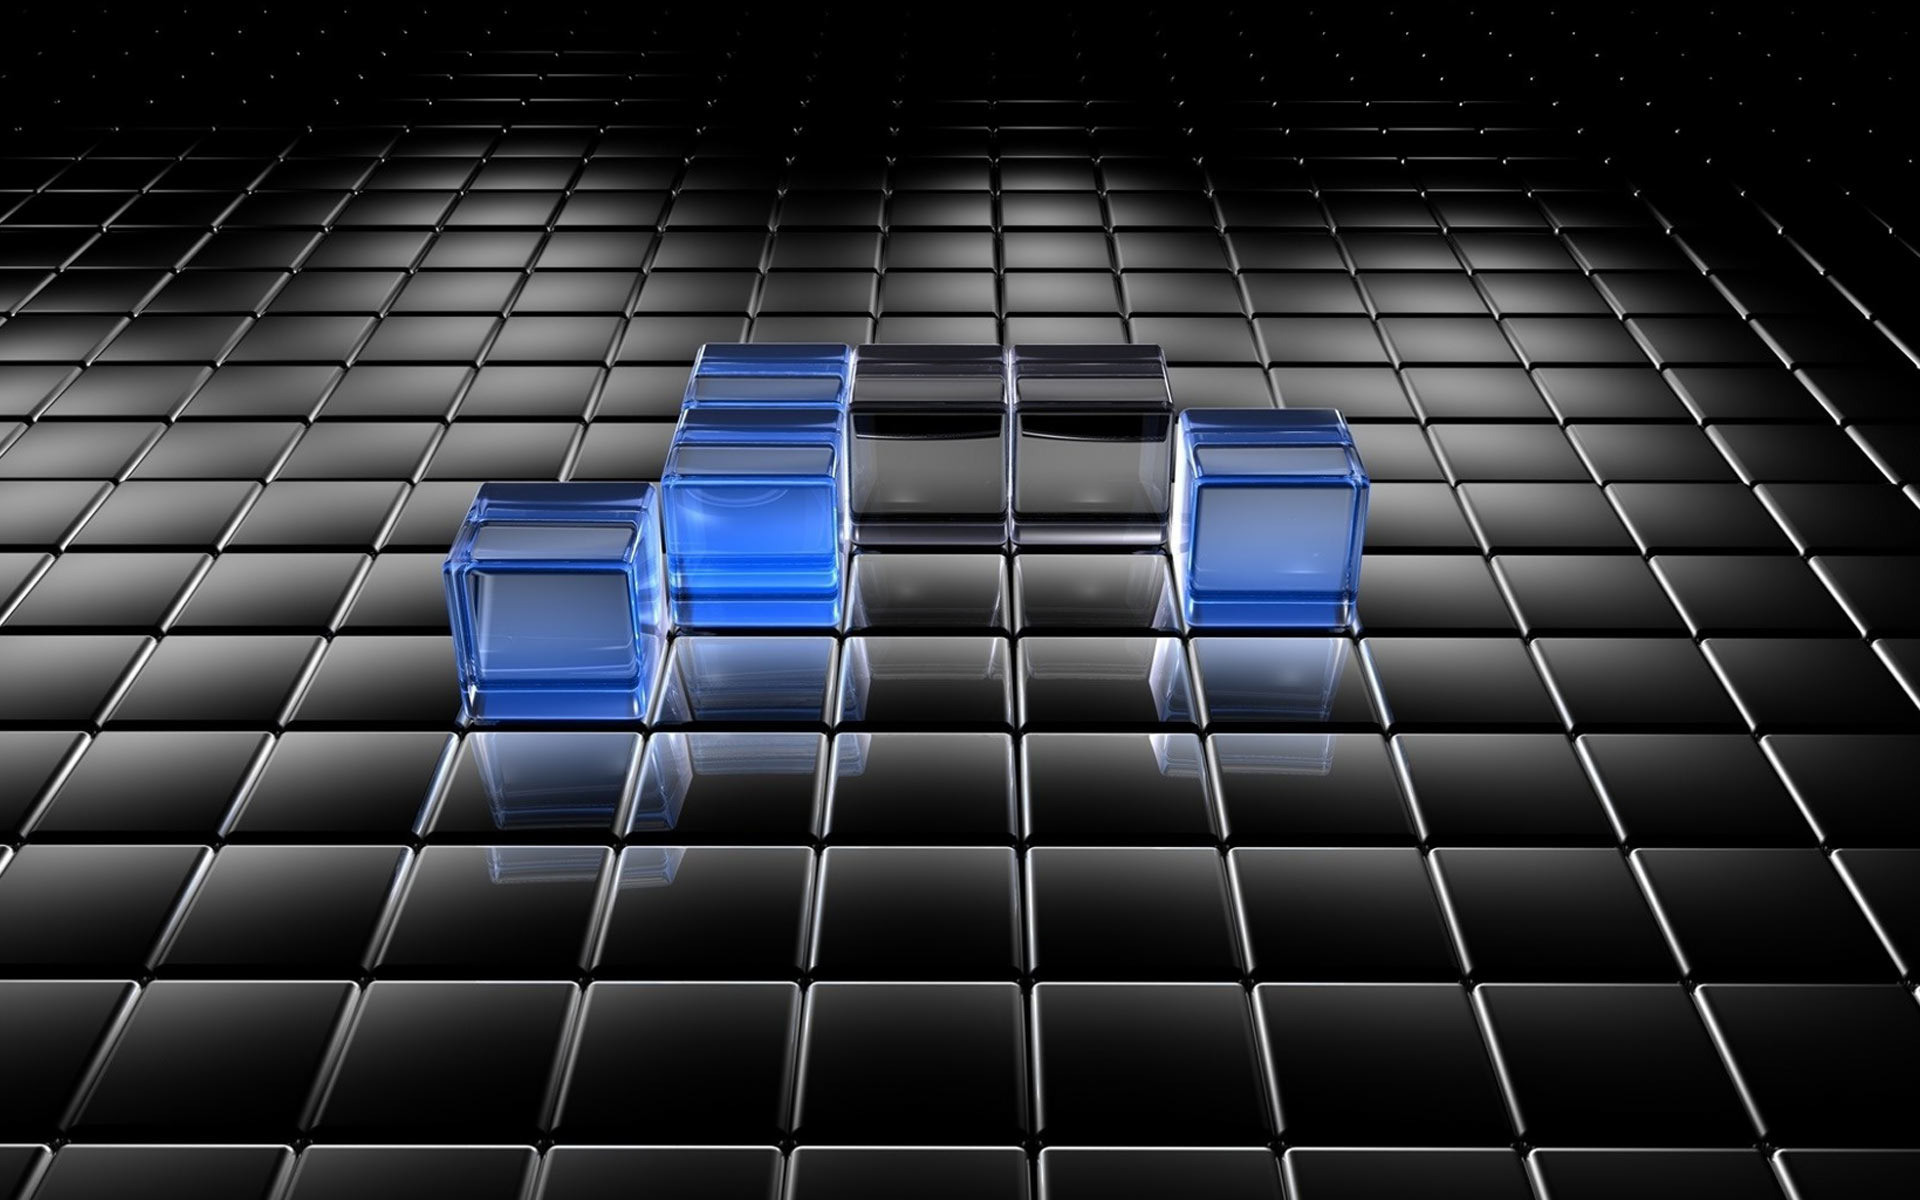 Black and blue translucent cubes wallpaper #118